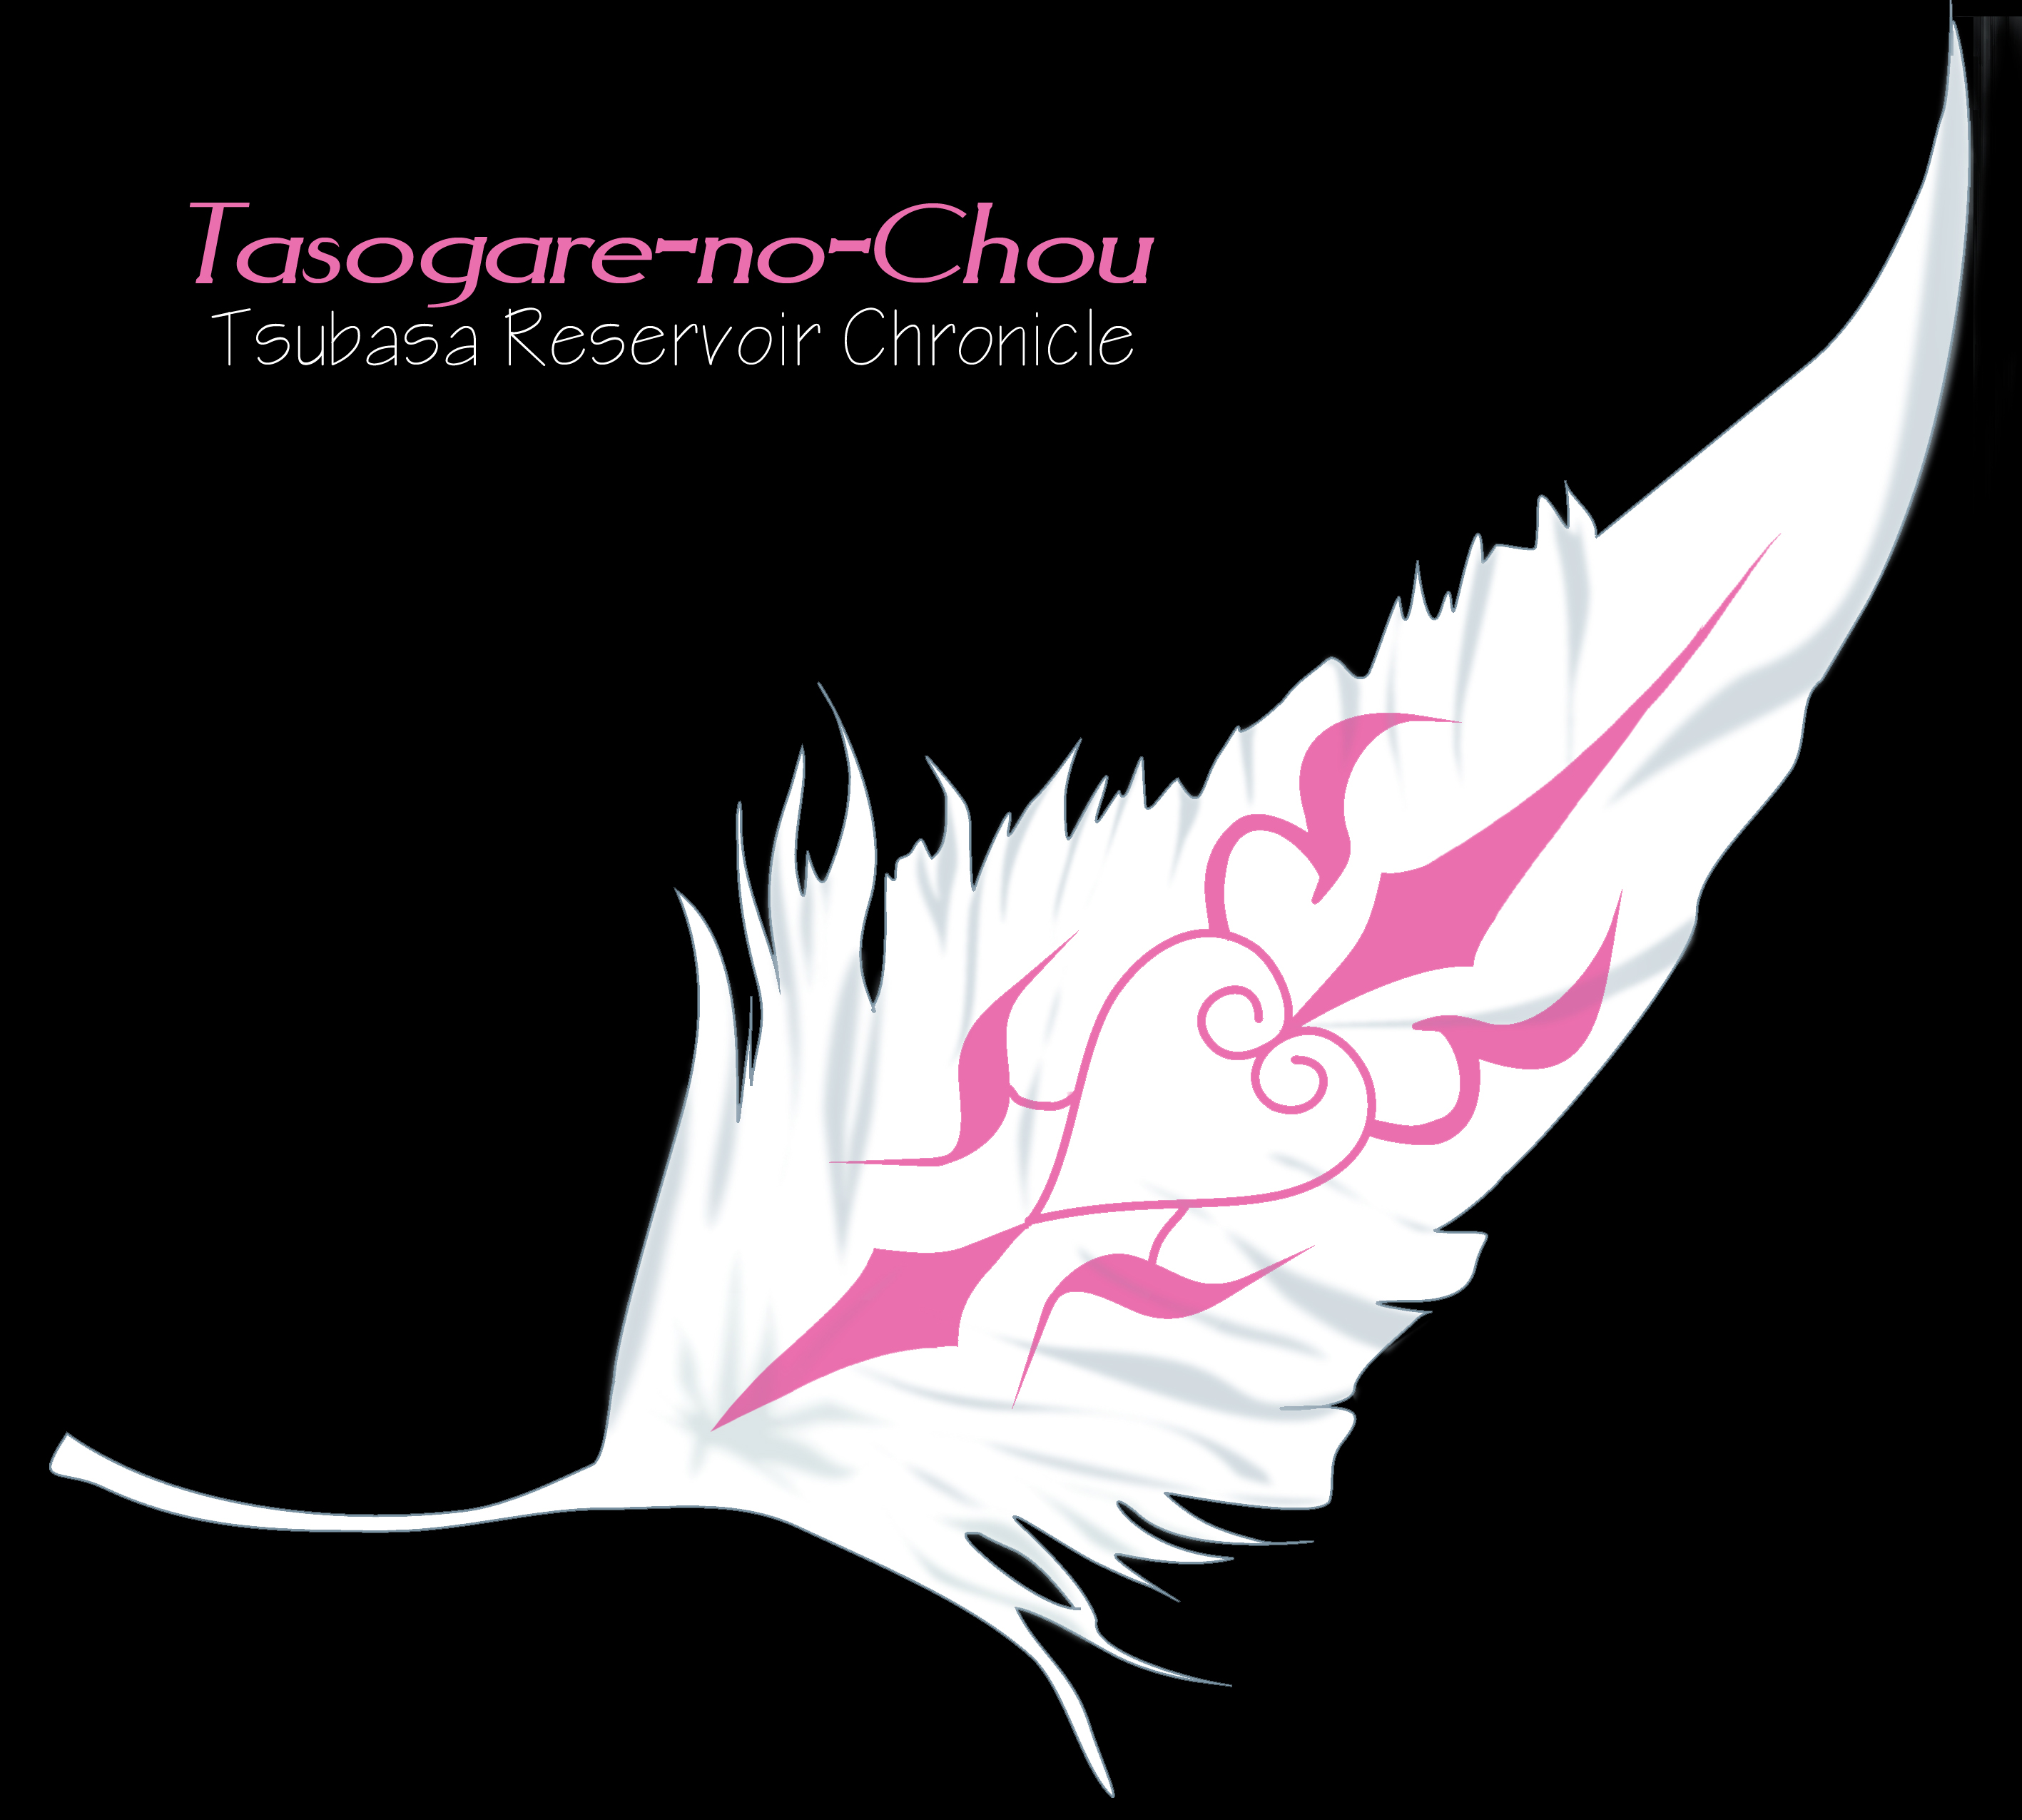 Tsubasa Reservoir Chronicle: Princess's Feather